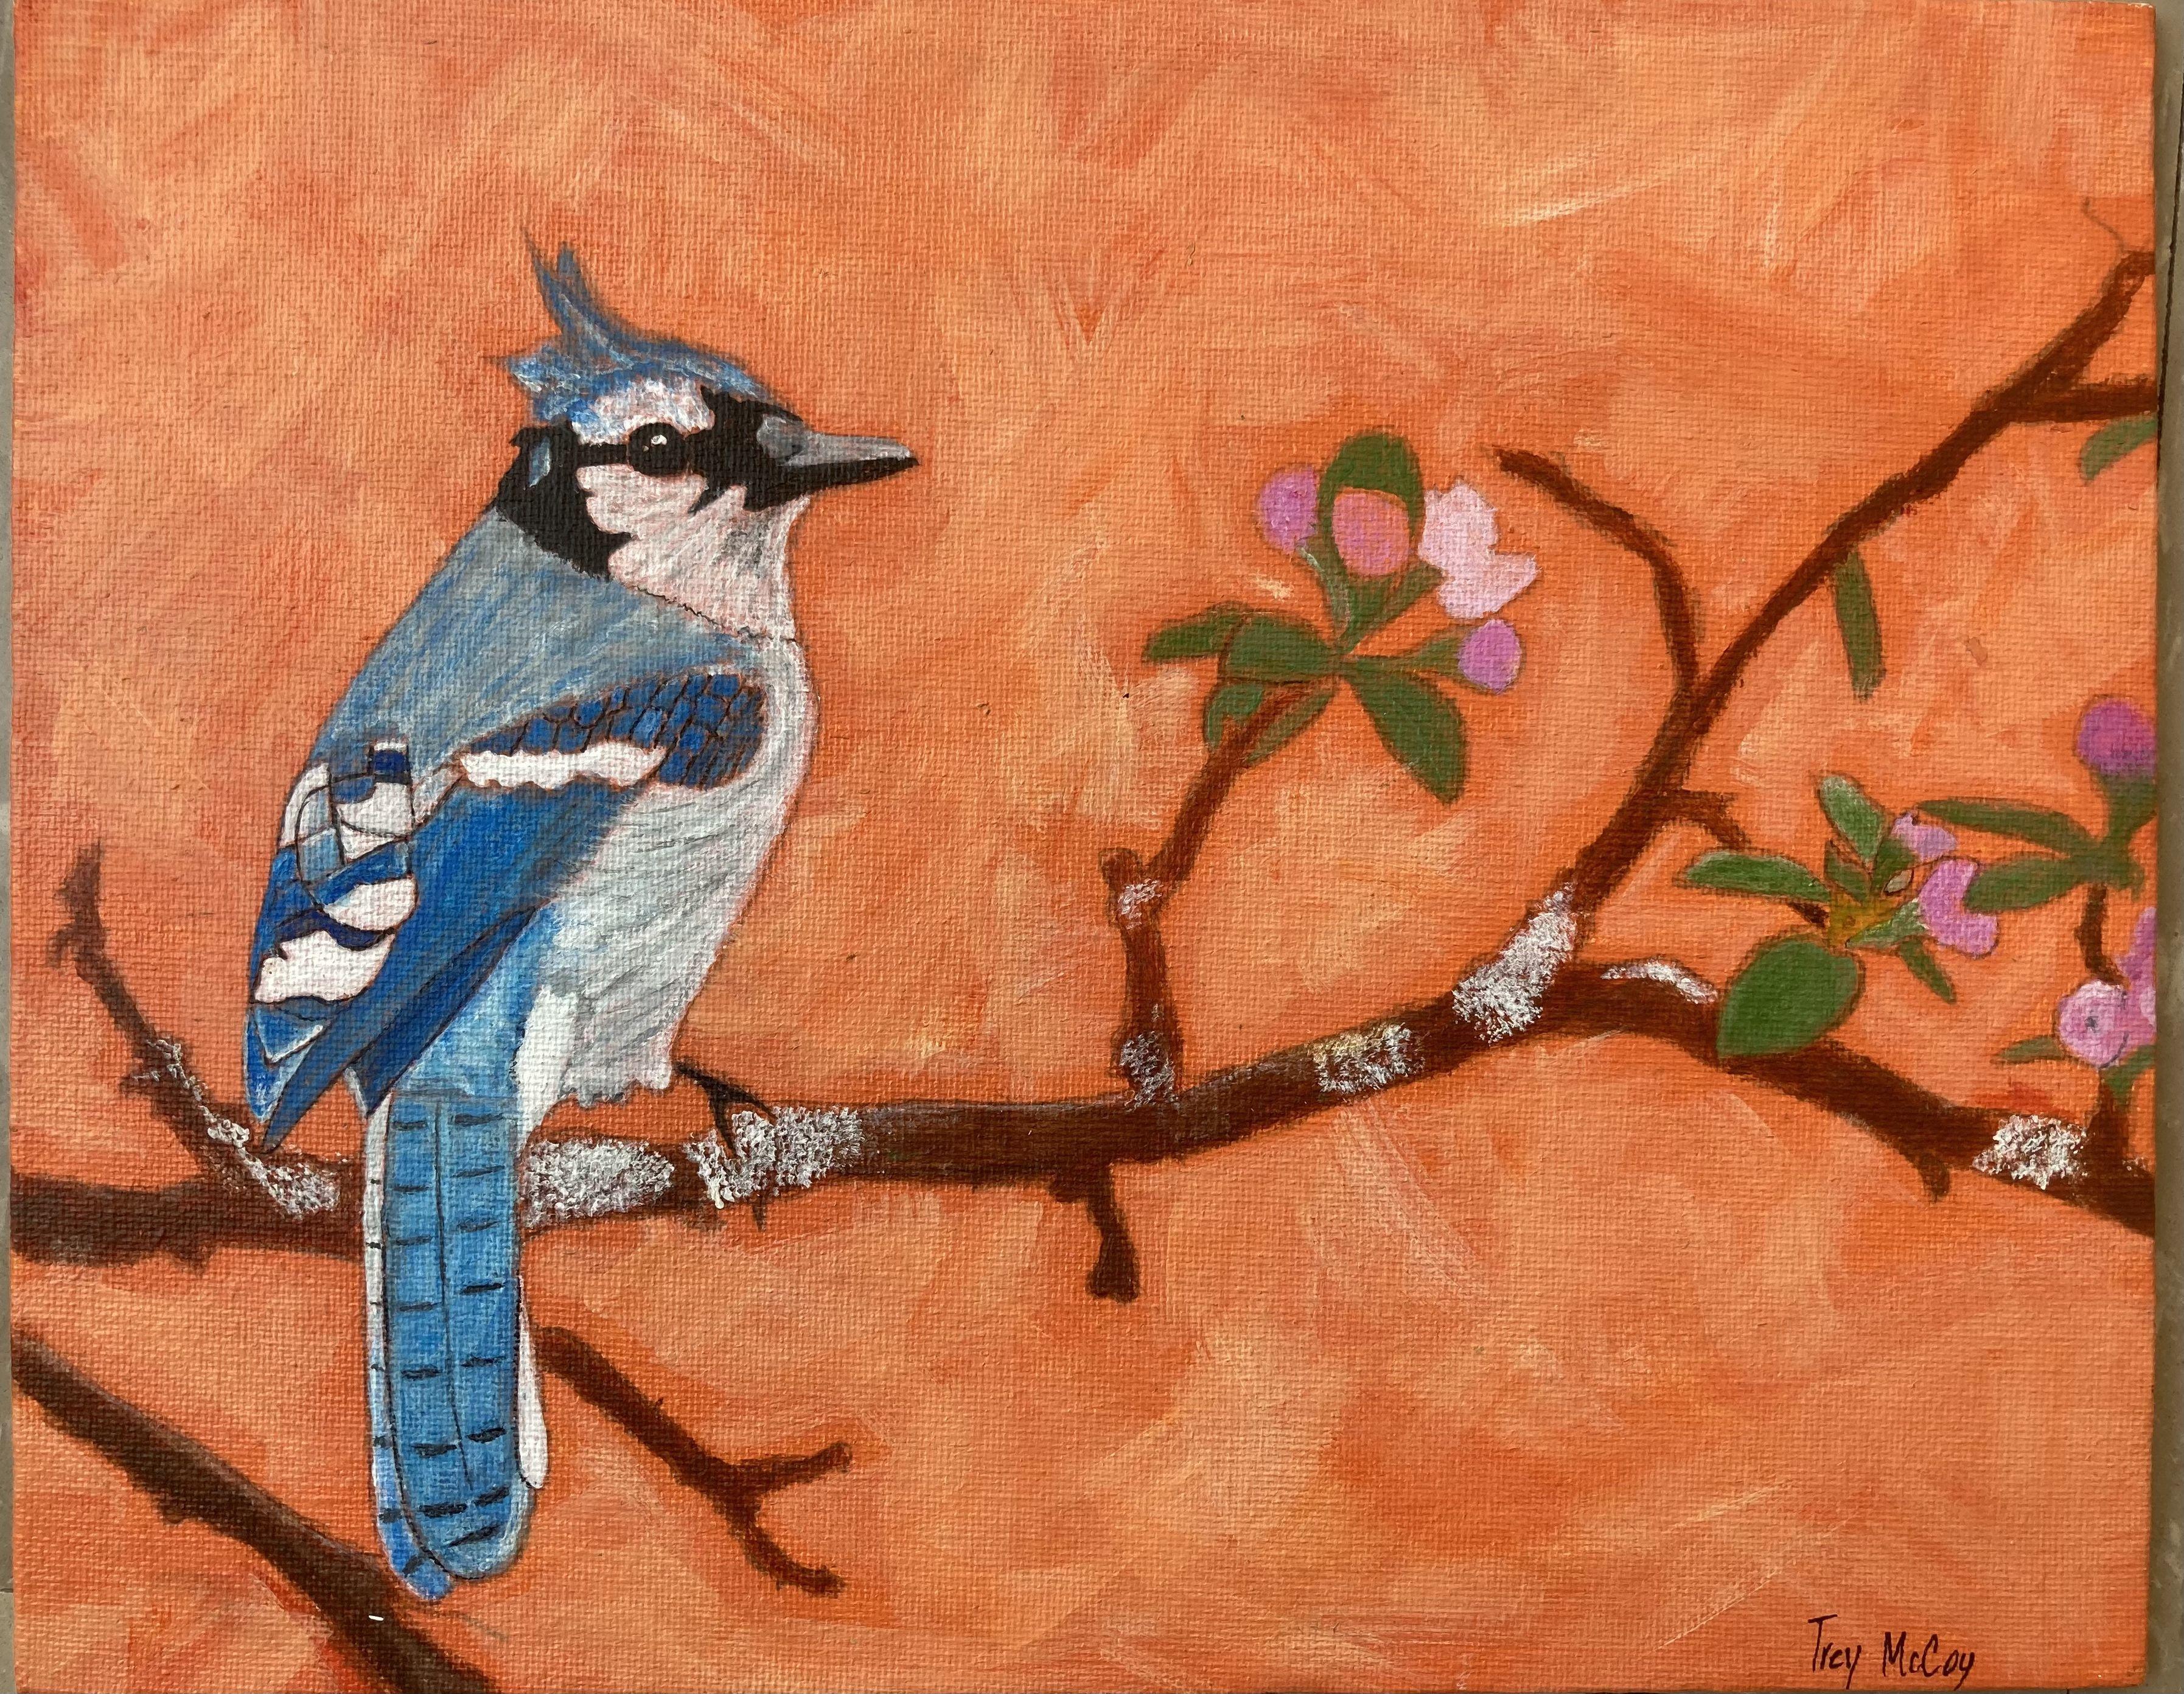 Realism - Trey M.